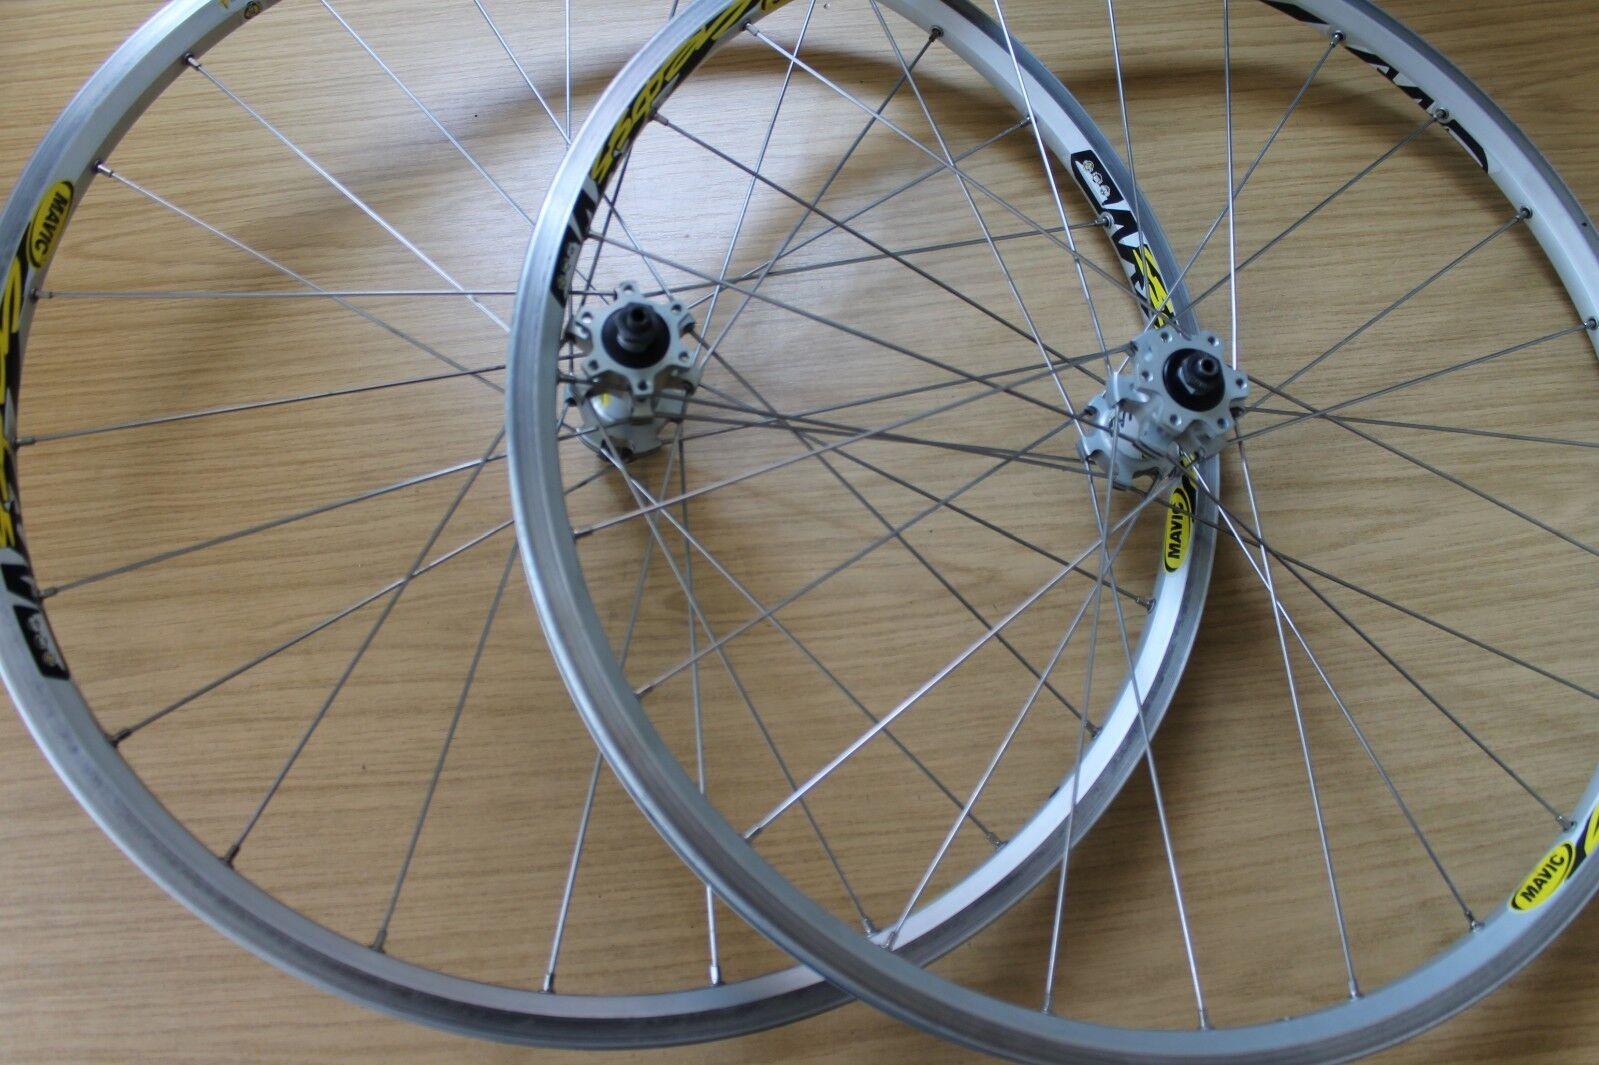 ab1c30c9997 DT Swiss N'duro 6 Bolt Disc Ex1750 Mountain Bike Wheels 26